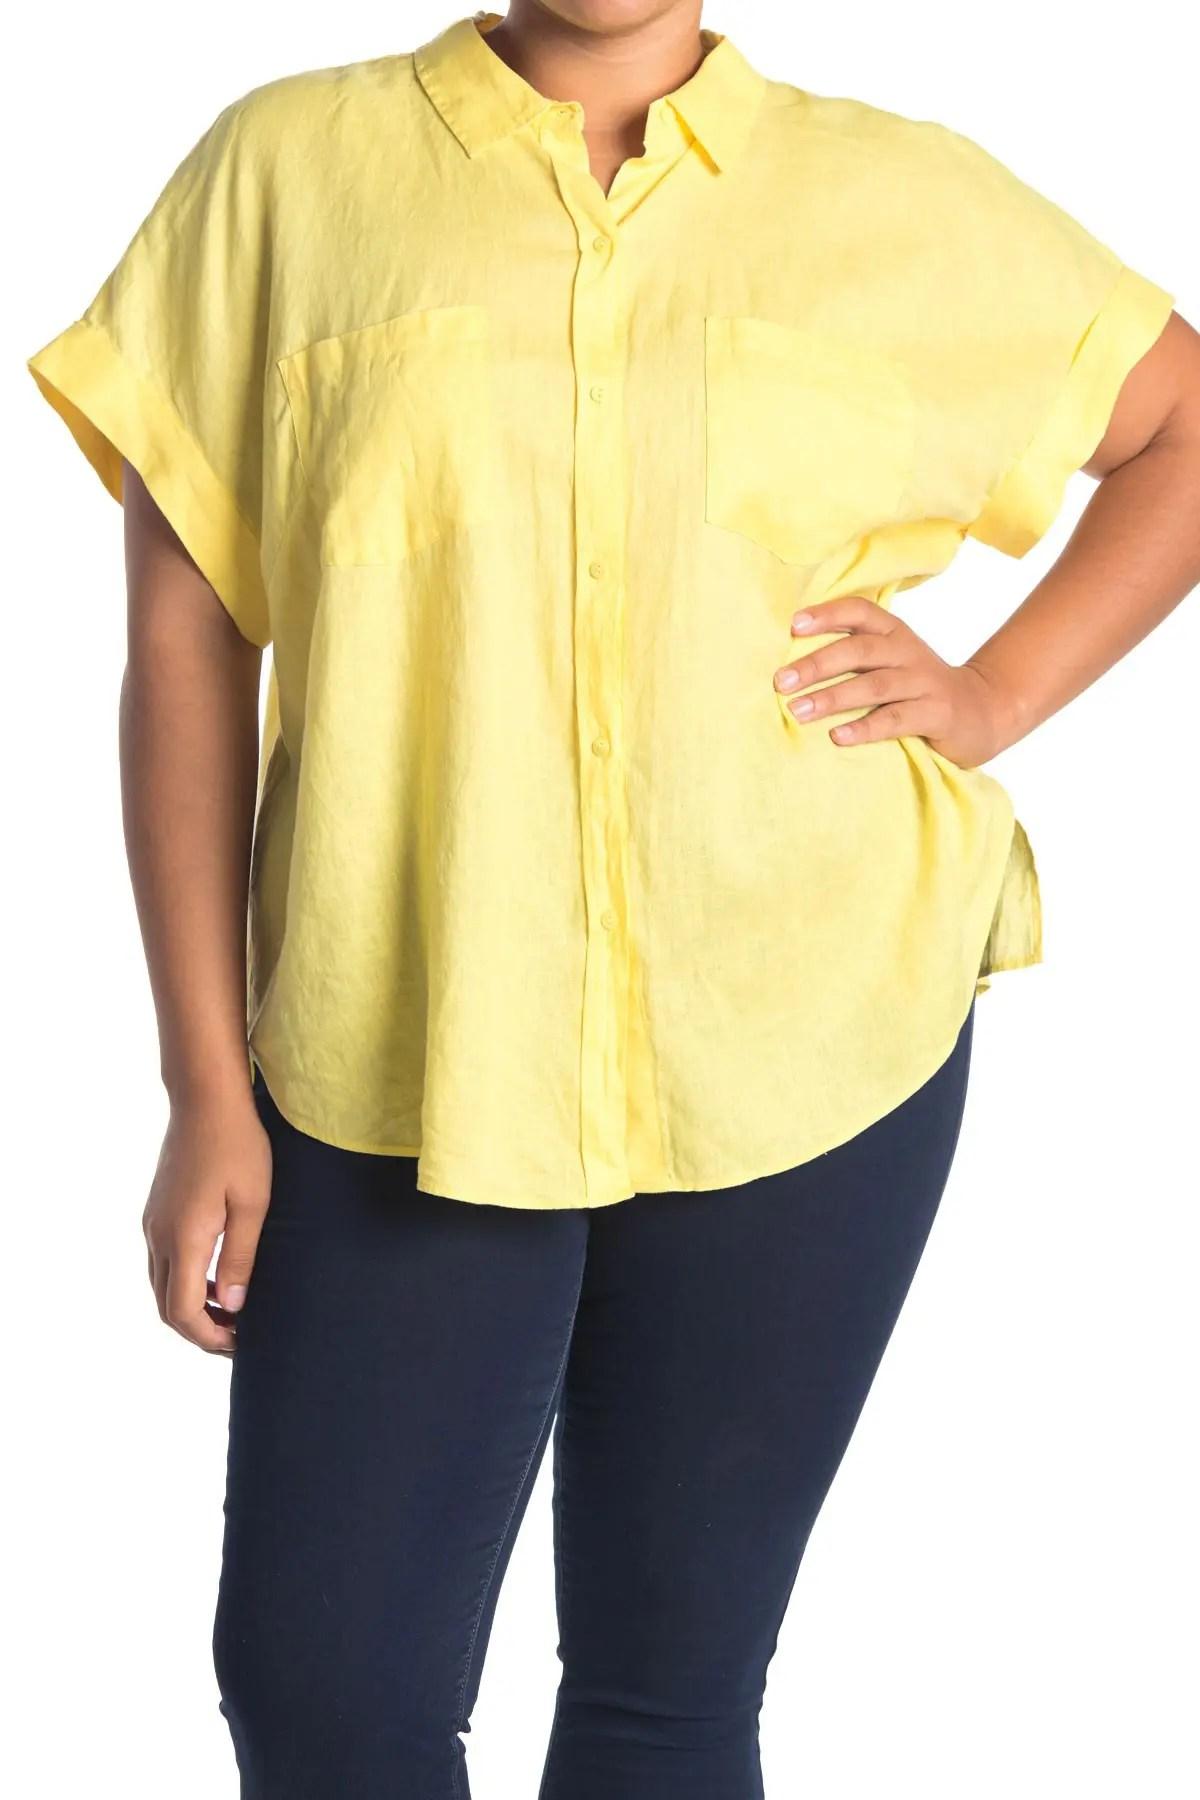 blouses shirts nordstrom rack